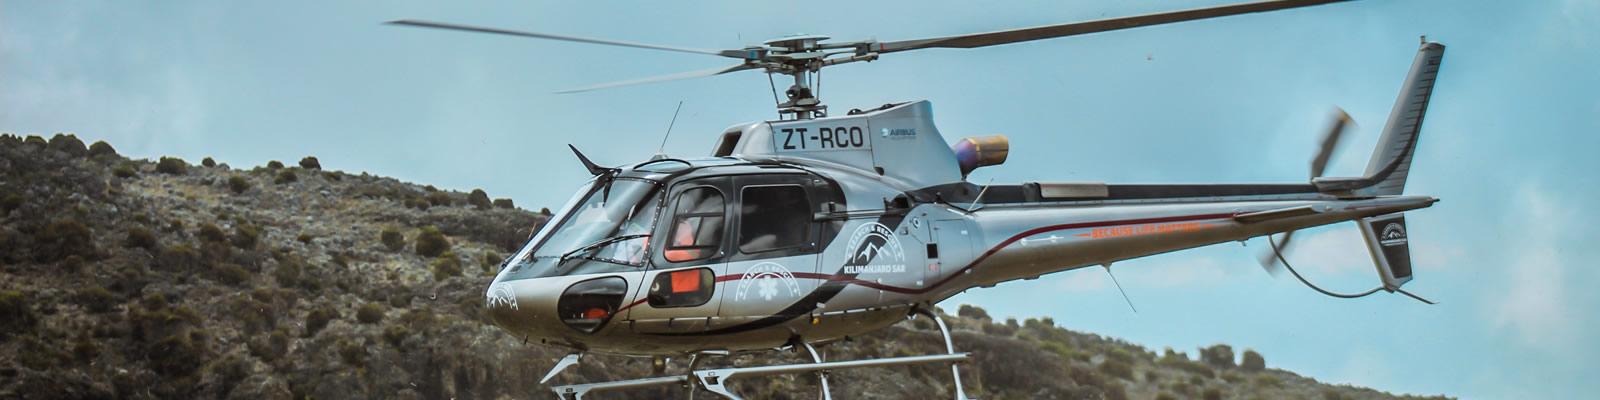 Mount Kilimanjaro Helicopter Scenic Day tour